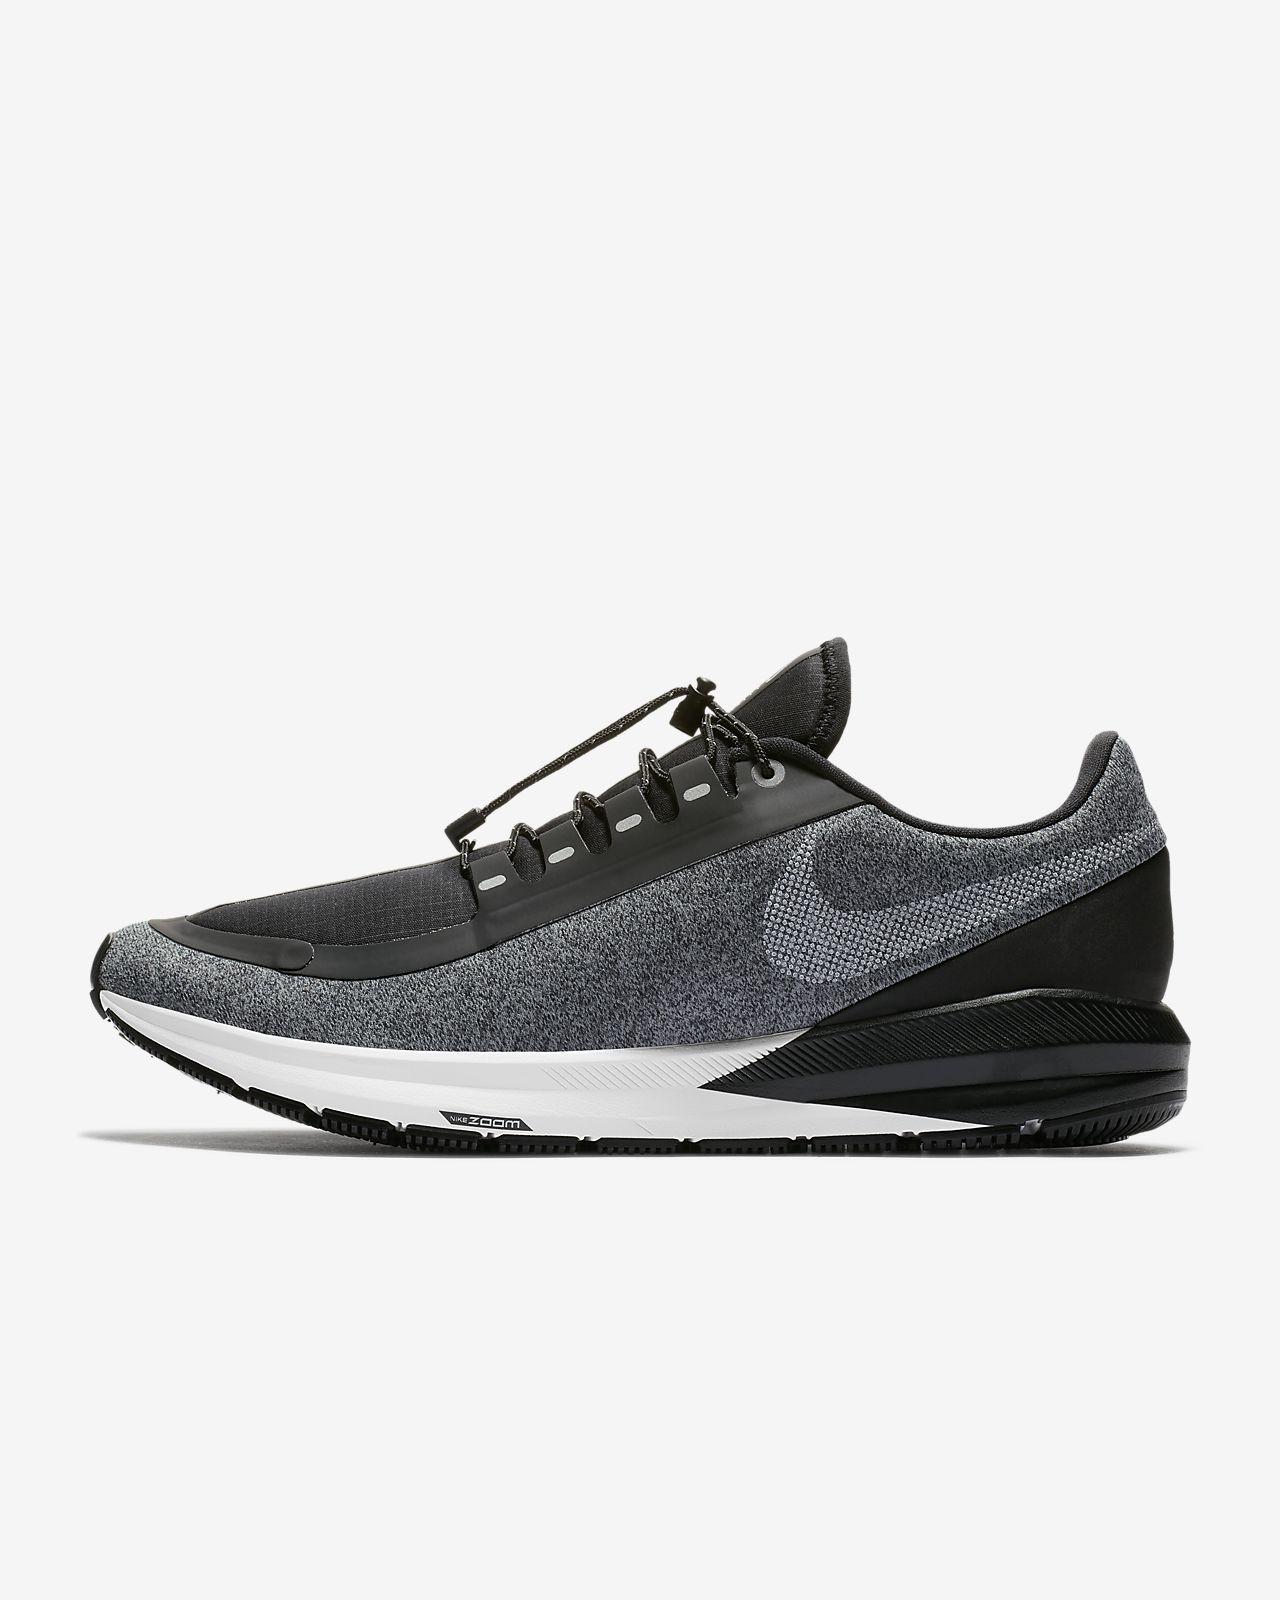 Nike Air Zoom Structure 22 Shield Water-Repellent Zapatillas de running - Hombre